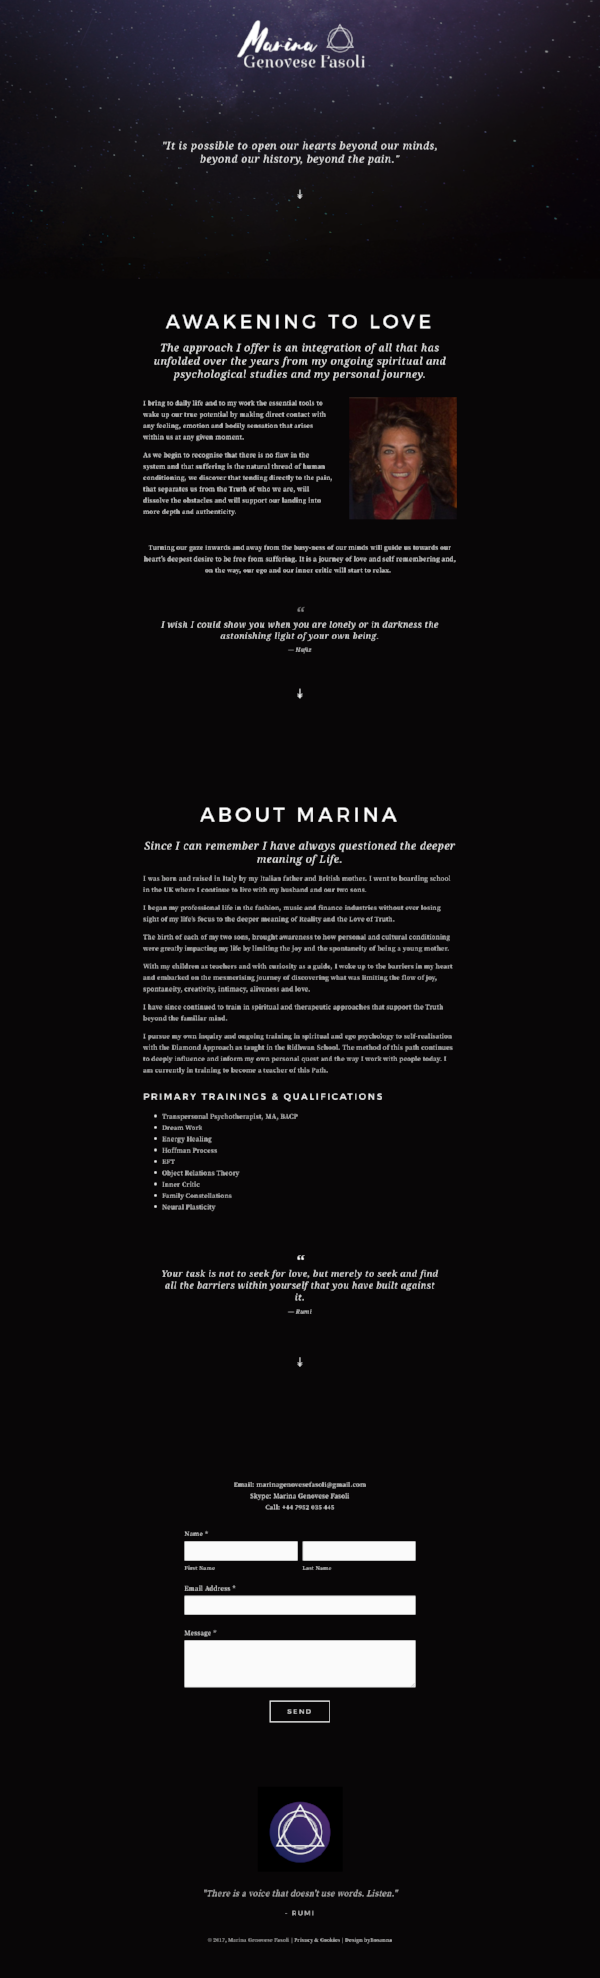 Marina website design in Squarespace   byRosanna